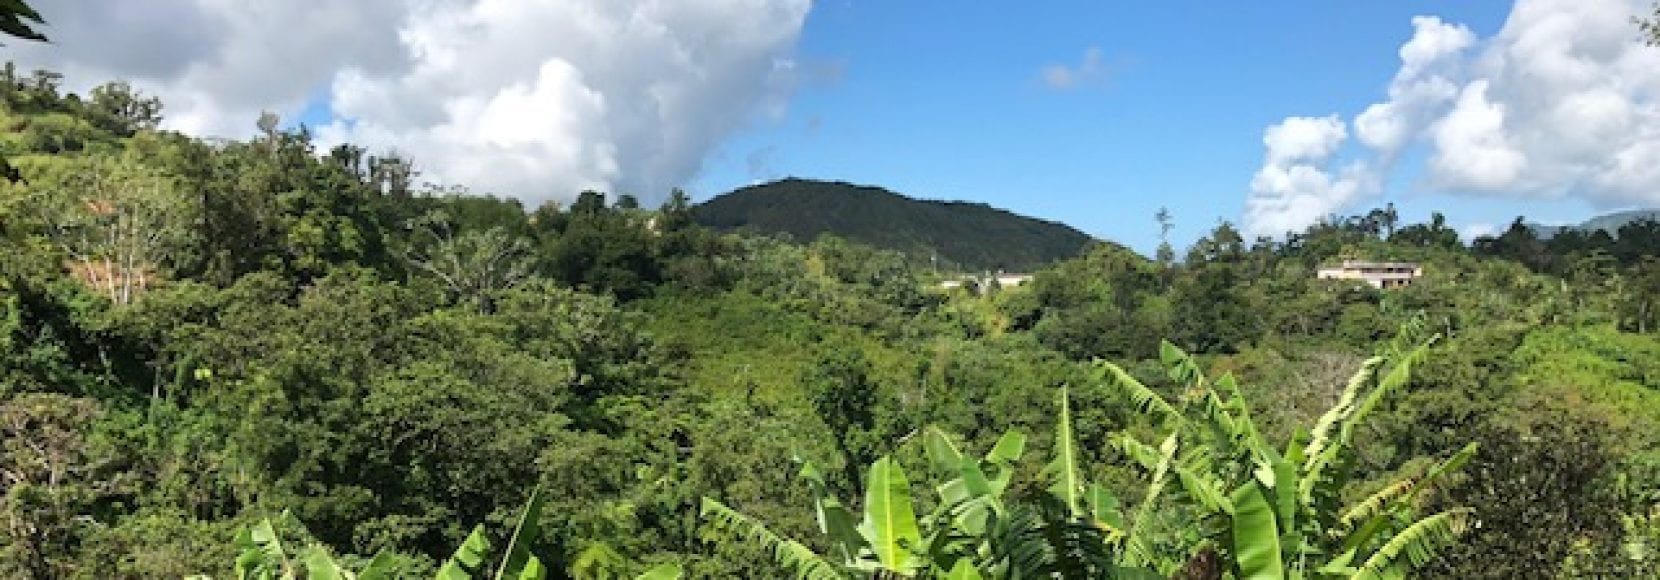 A landscape in Puerto Rico